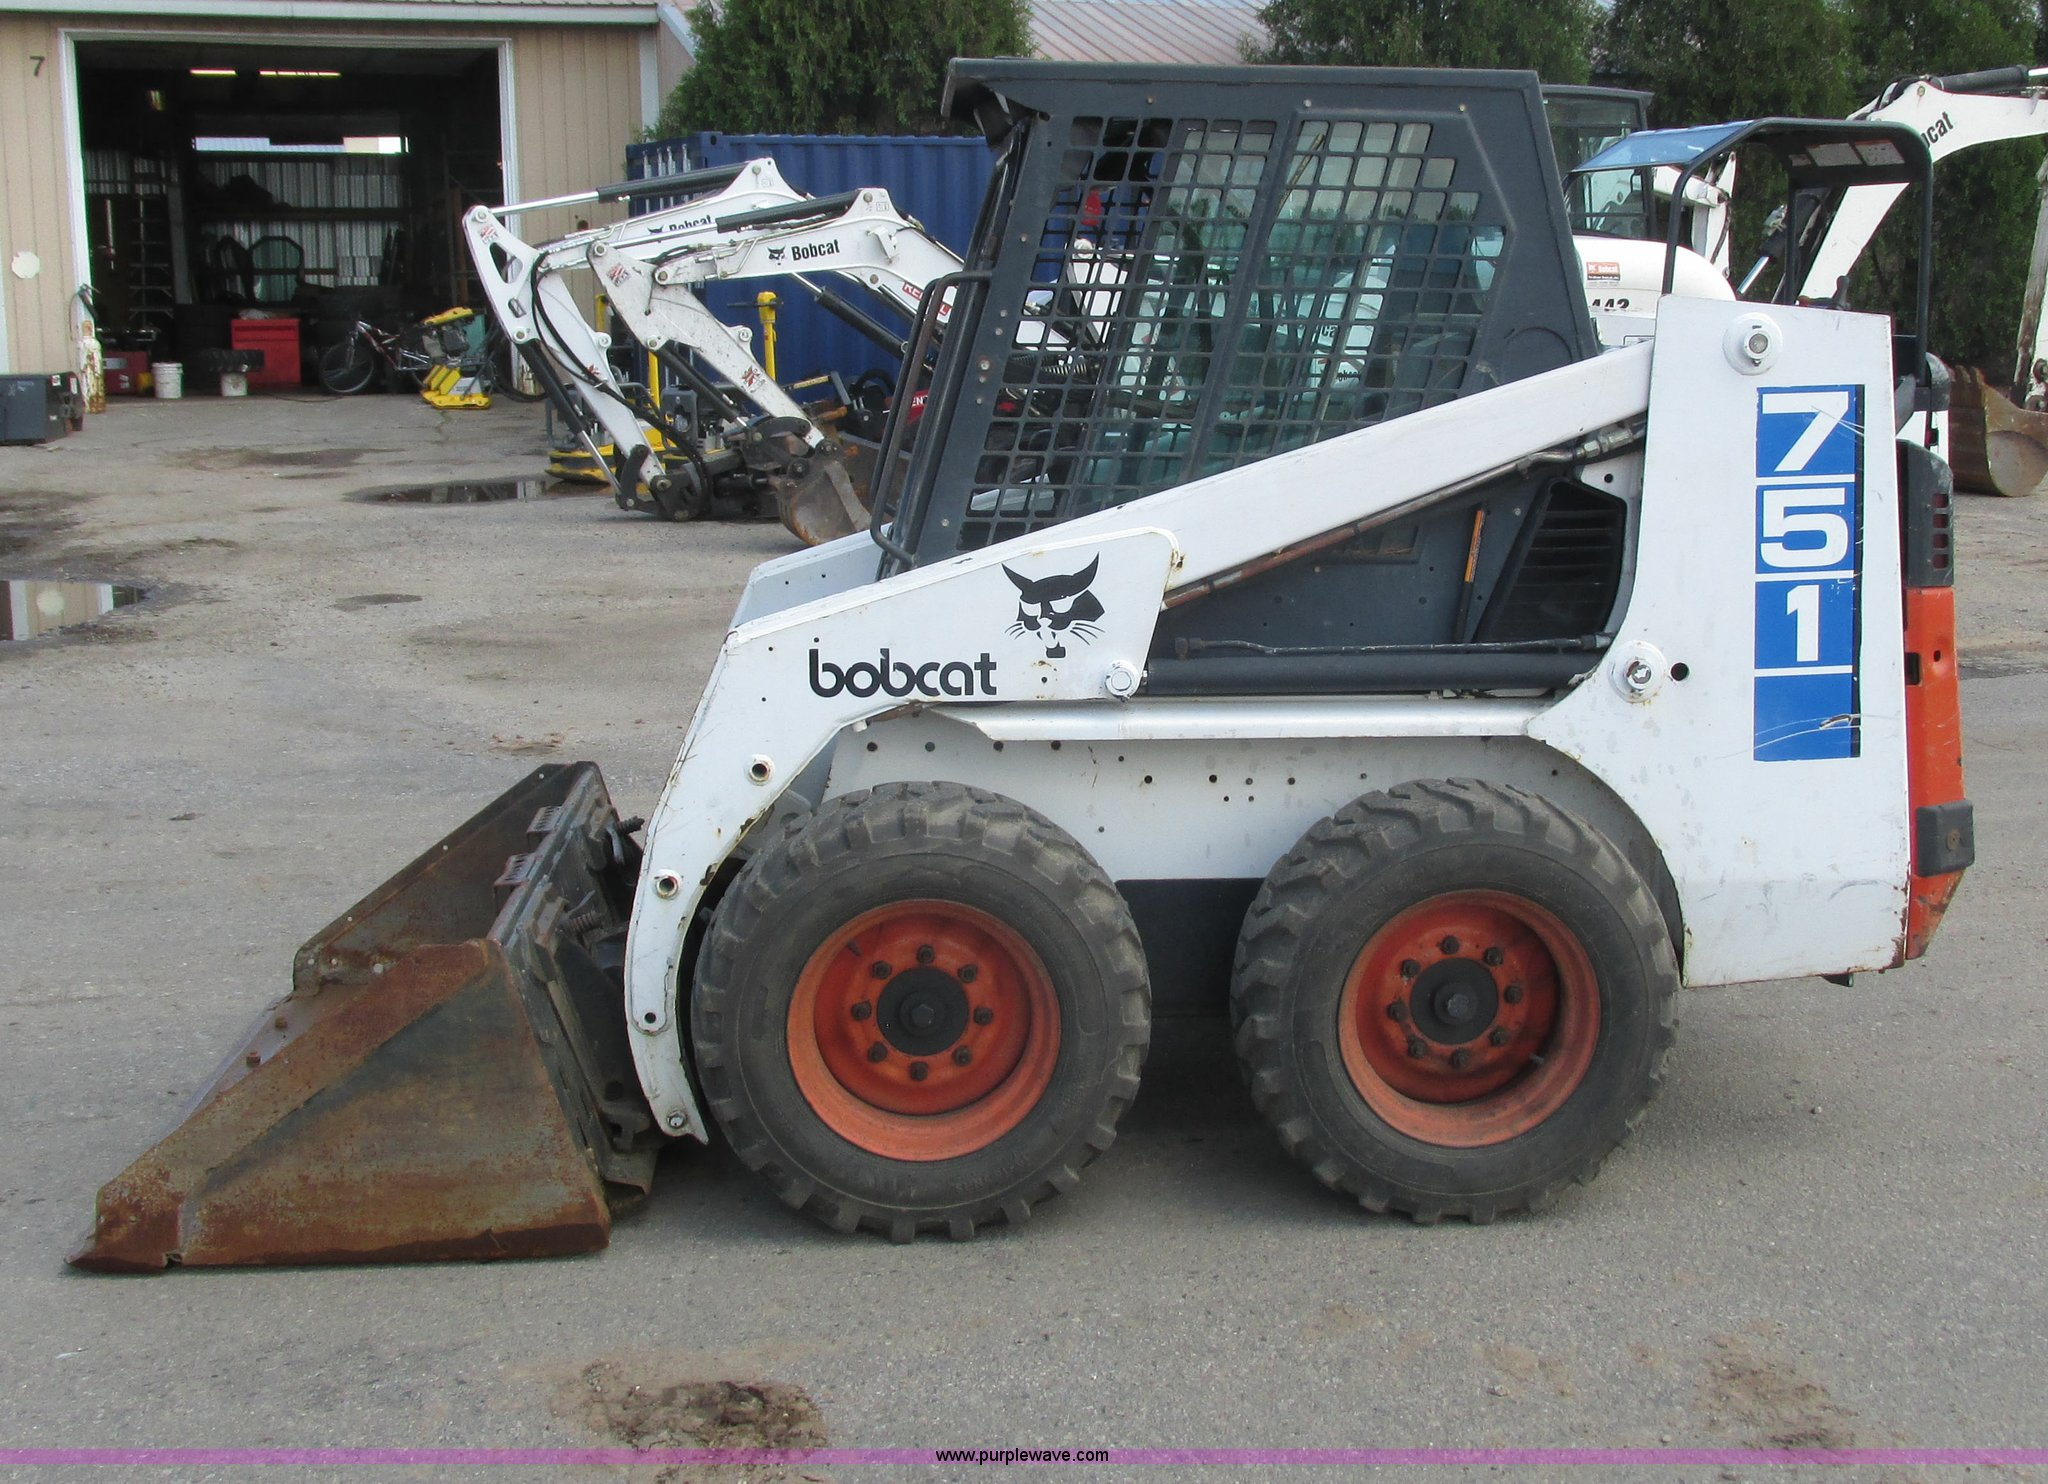 1996 Bobcat 751 skid steer | Item I3953 | SOLD! June 26 Tri-